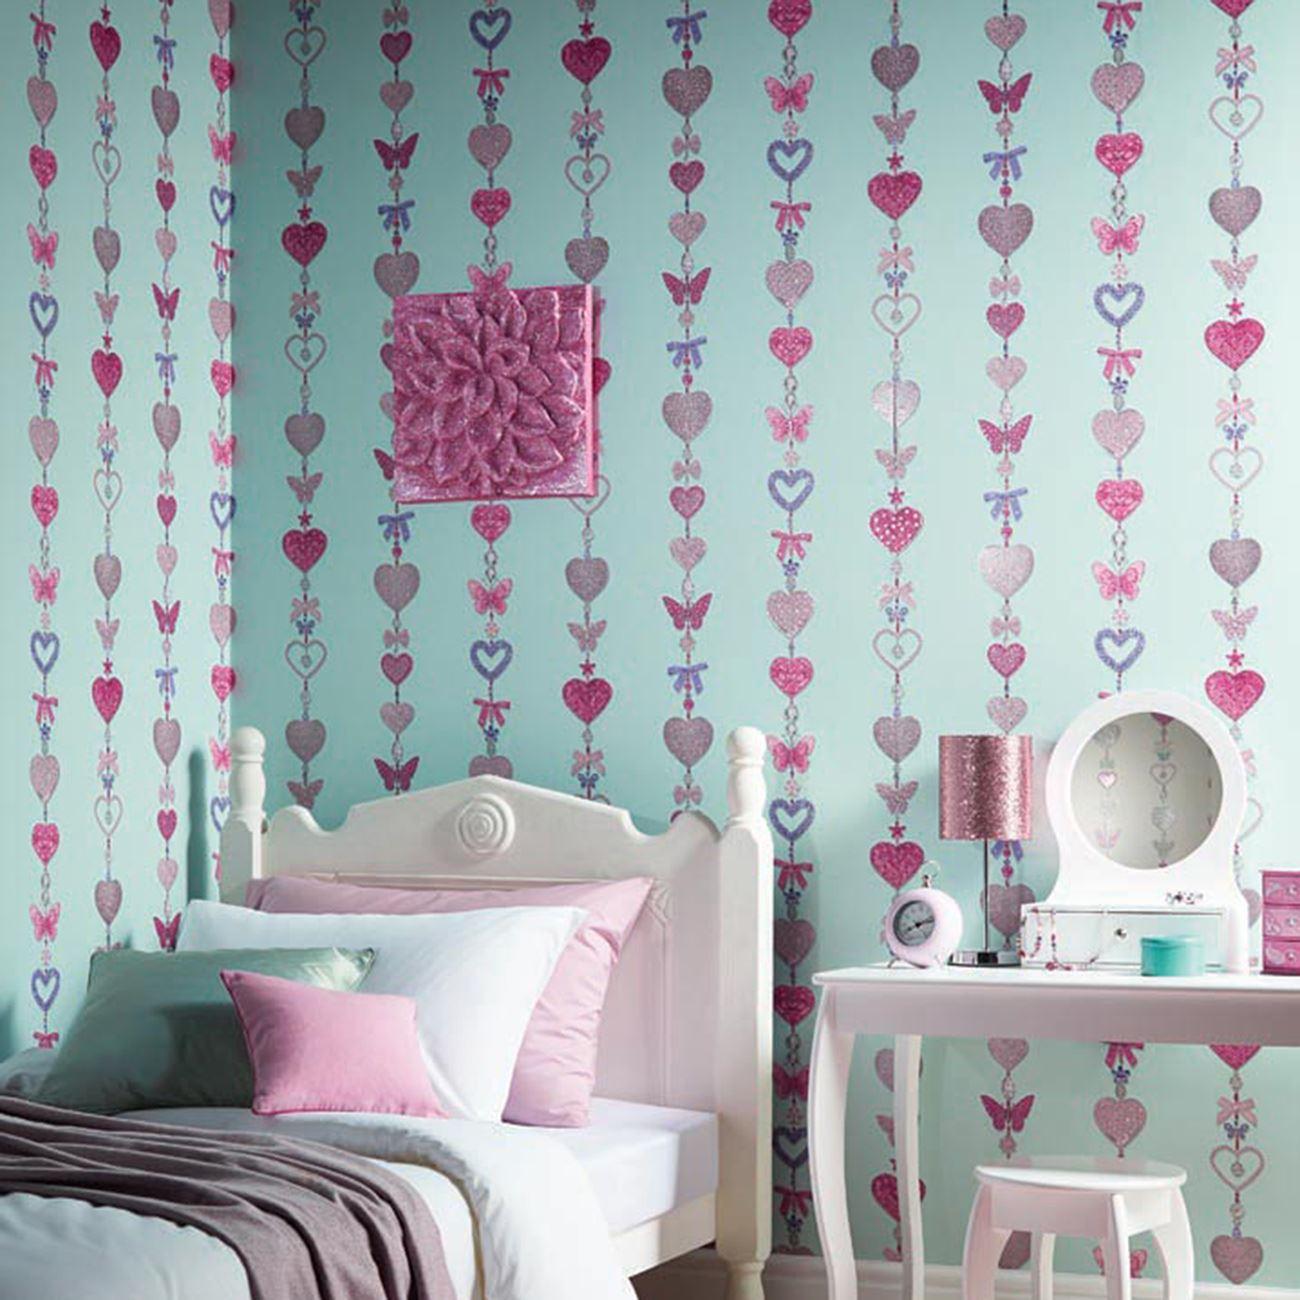 m dchen schick tapete kinder schlafzimmer eigenschaft wand. Black Bedroom Furniture Sets. Home Design Ideas